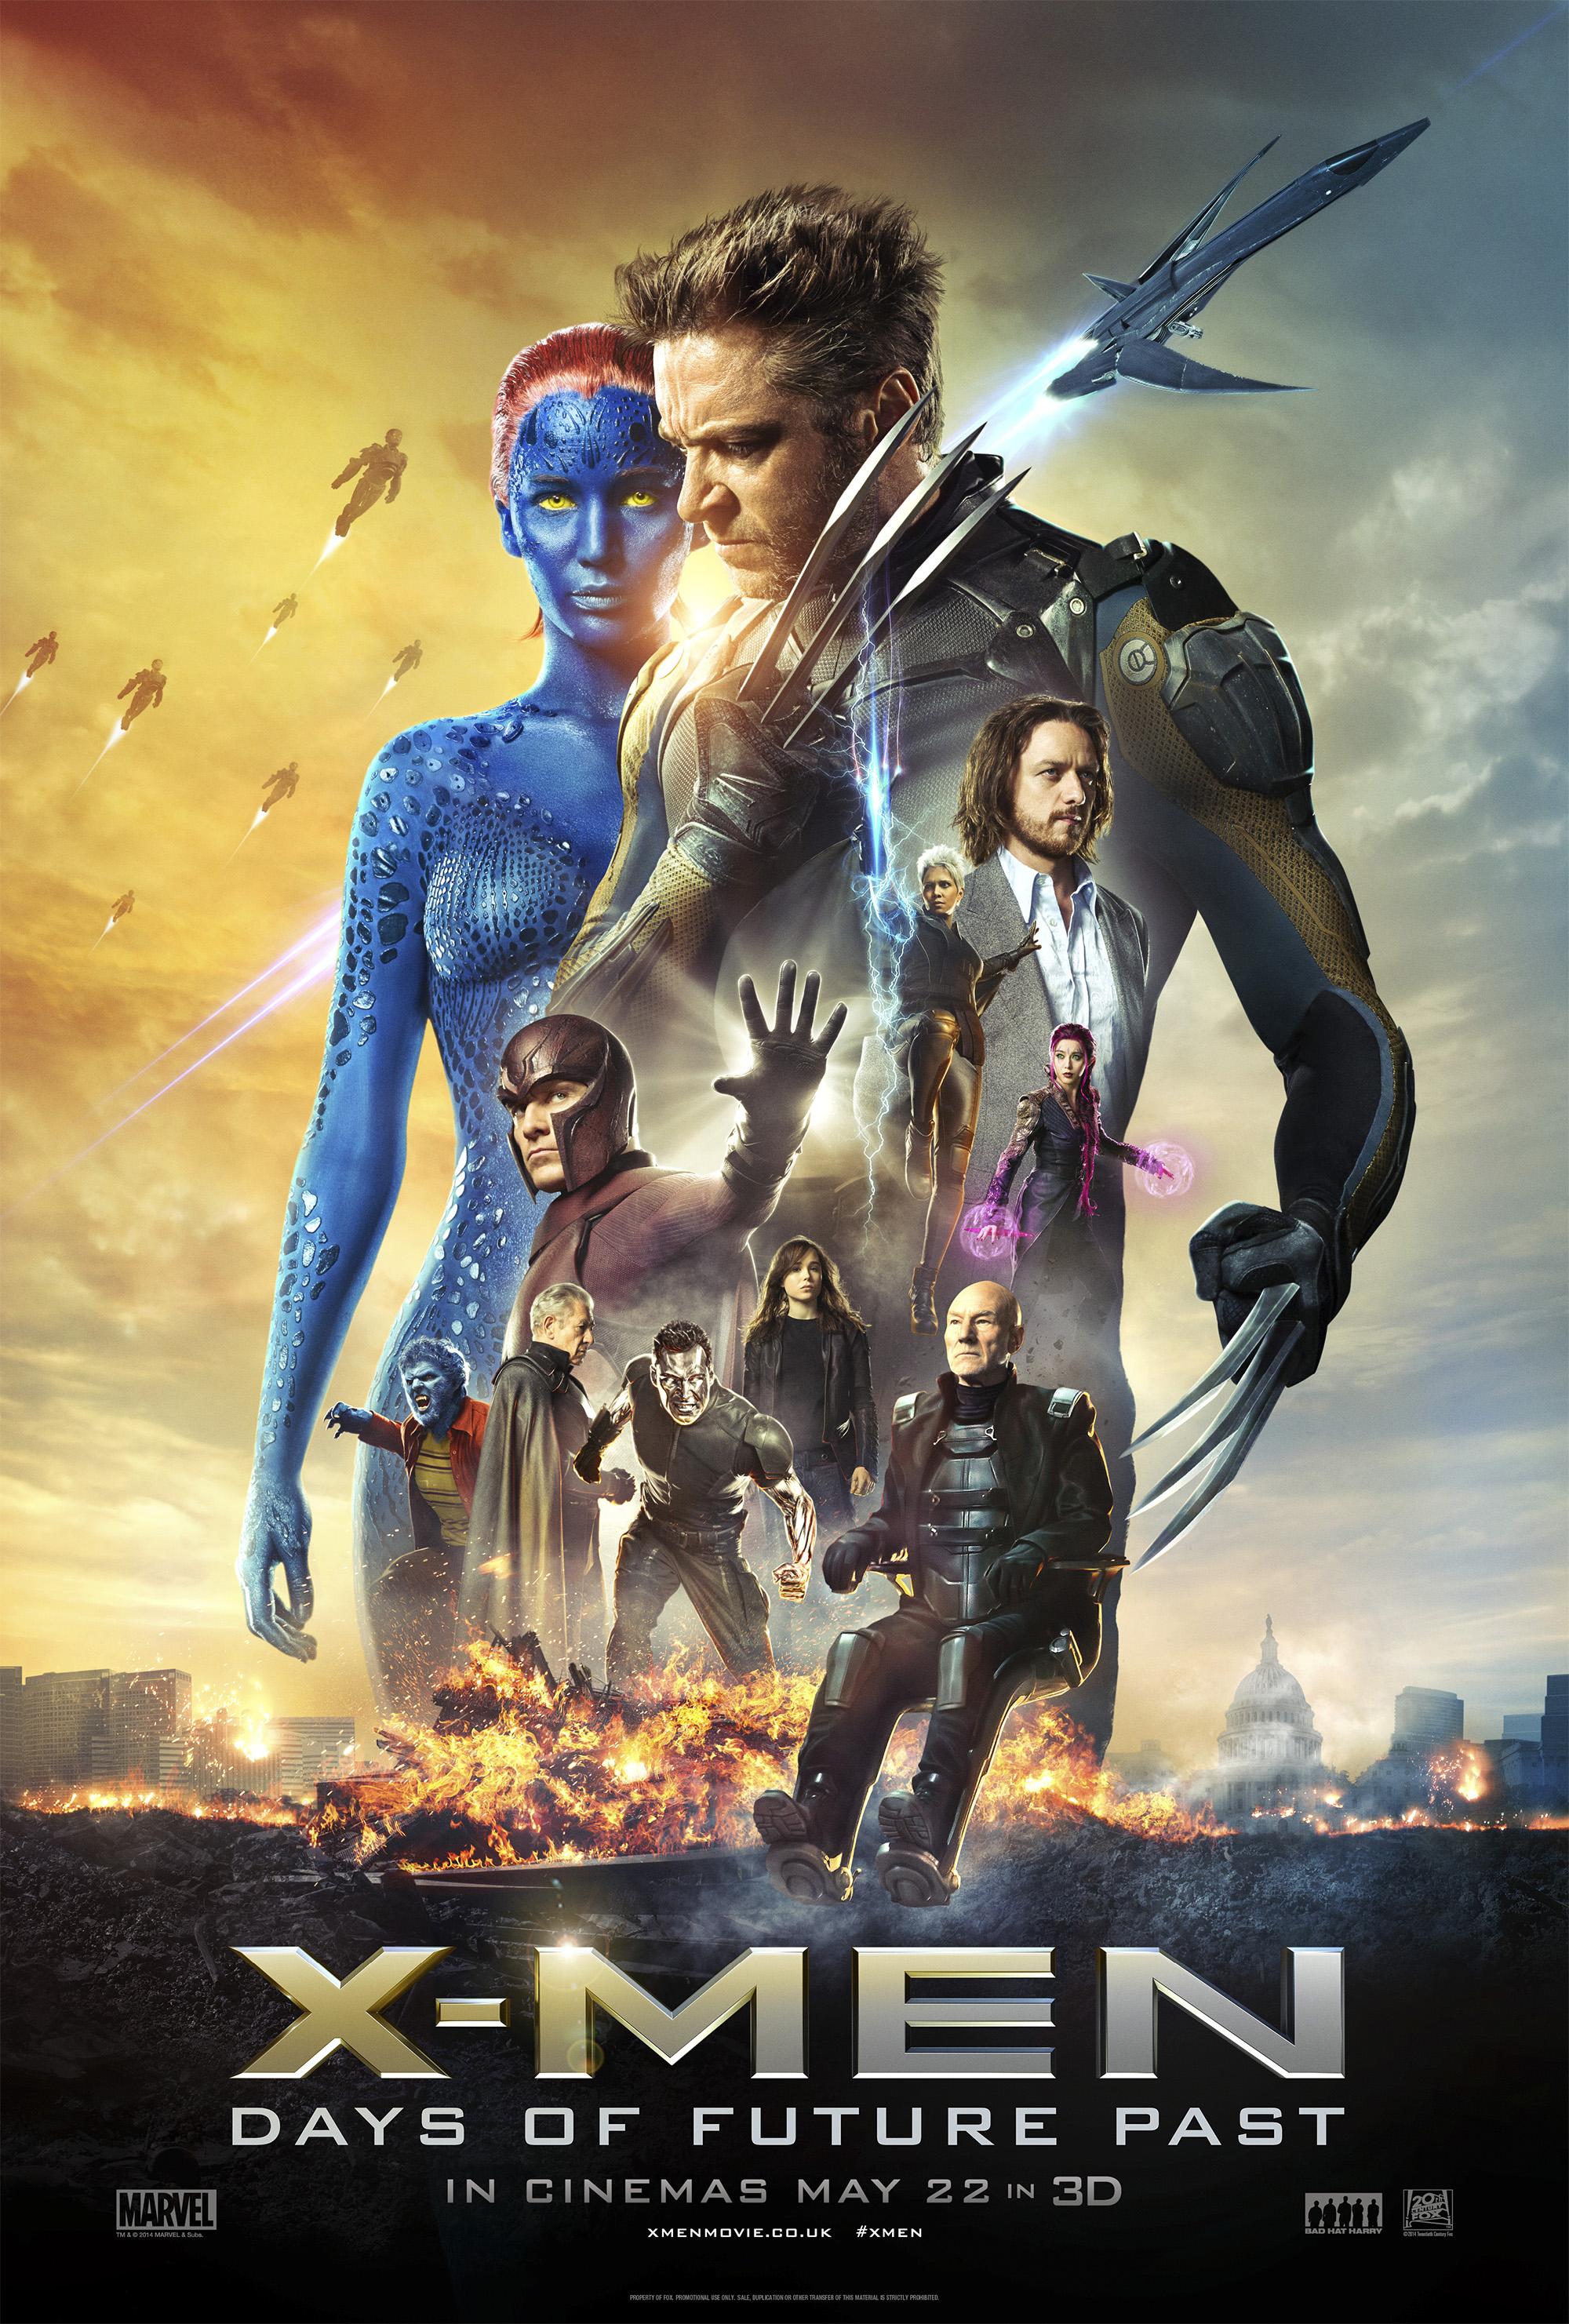 X-Men-Days-of-Future-Past-Movie-Poster.jpg